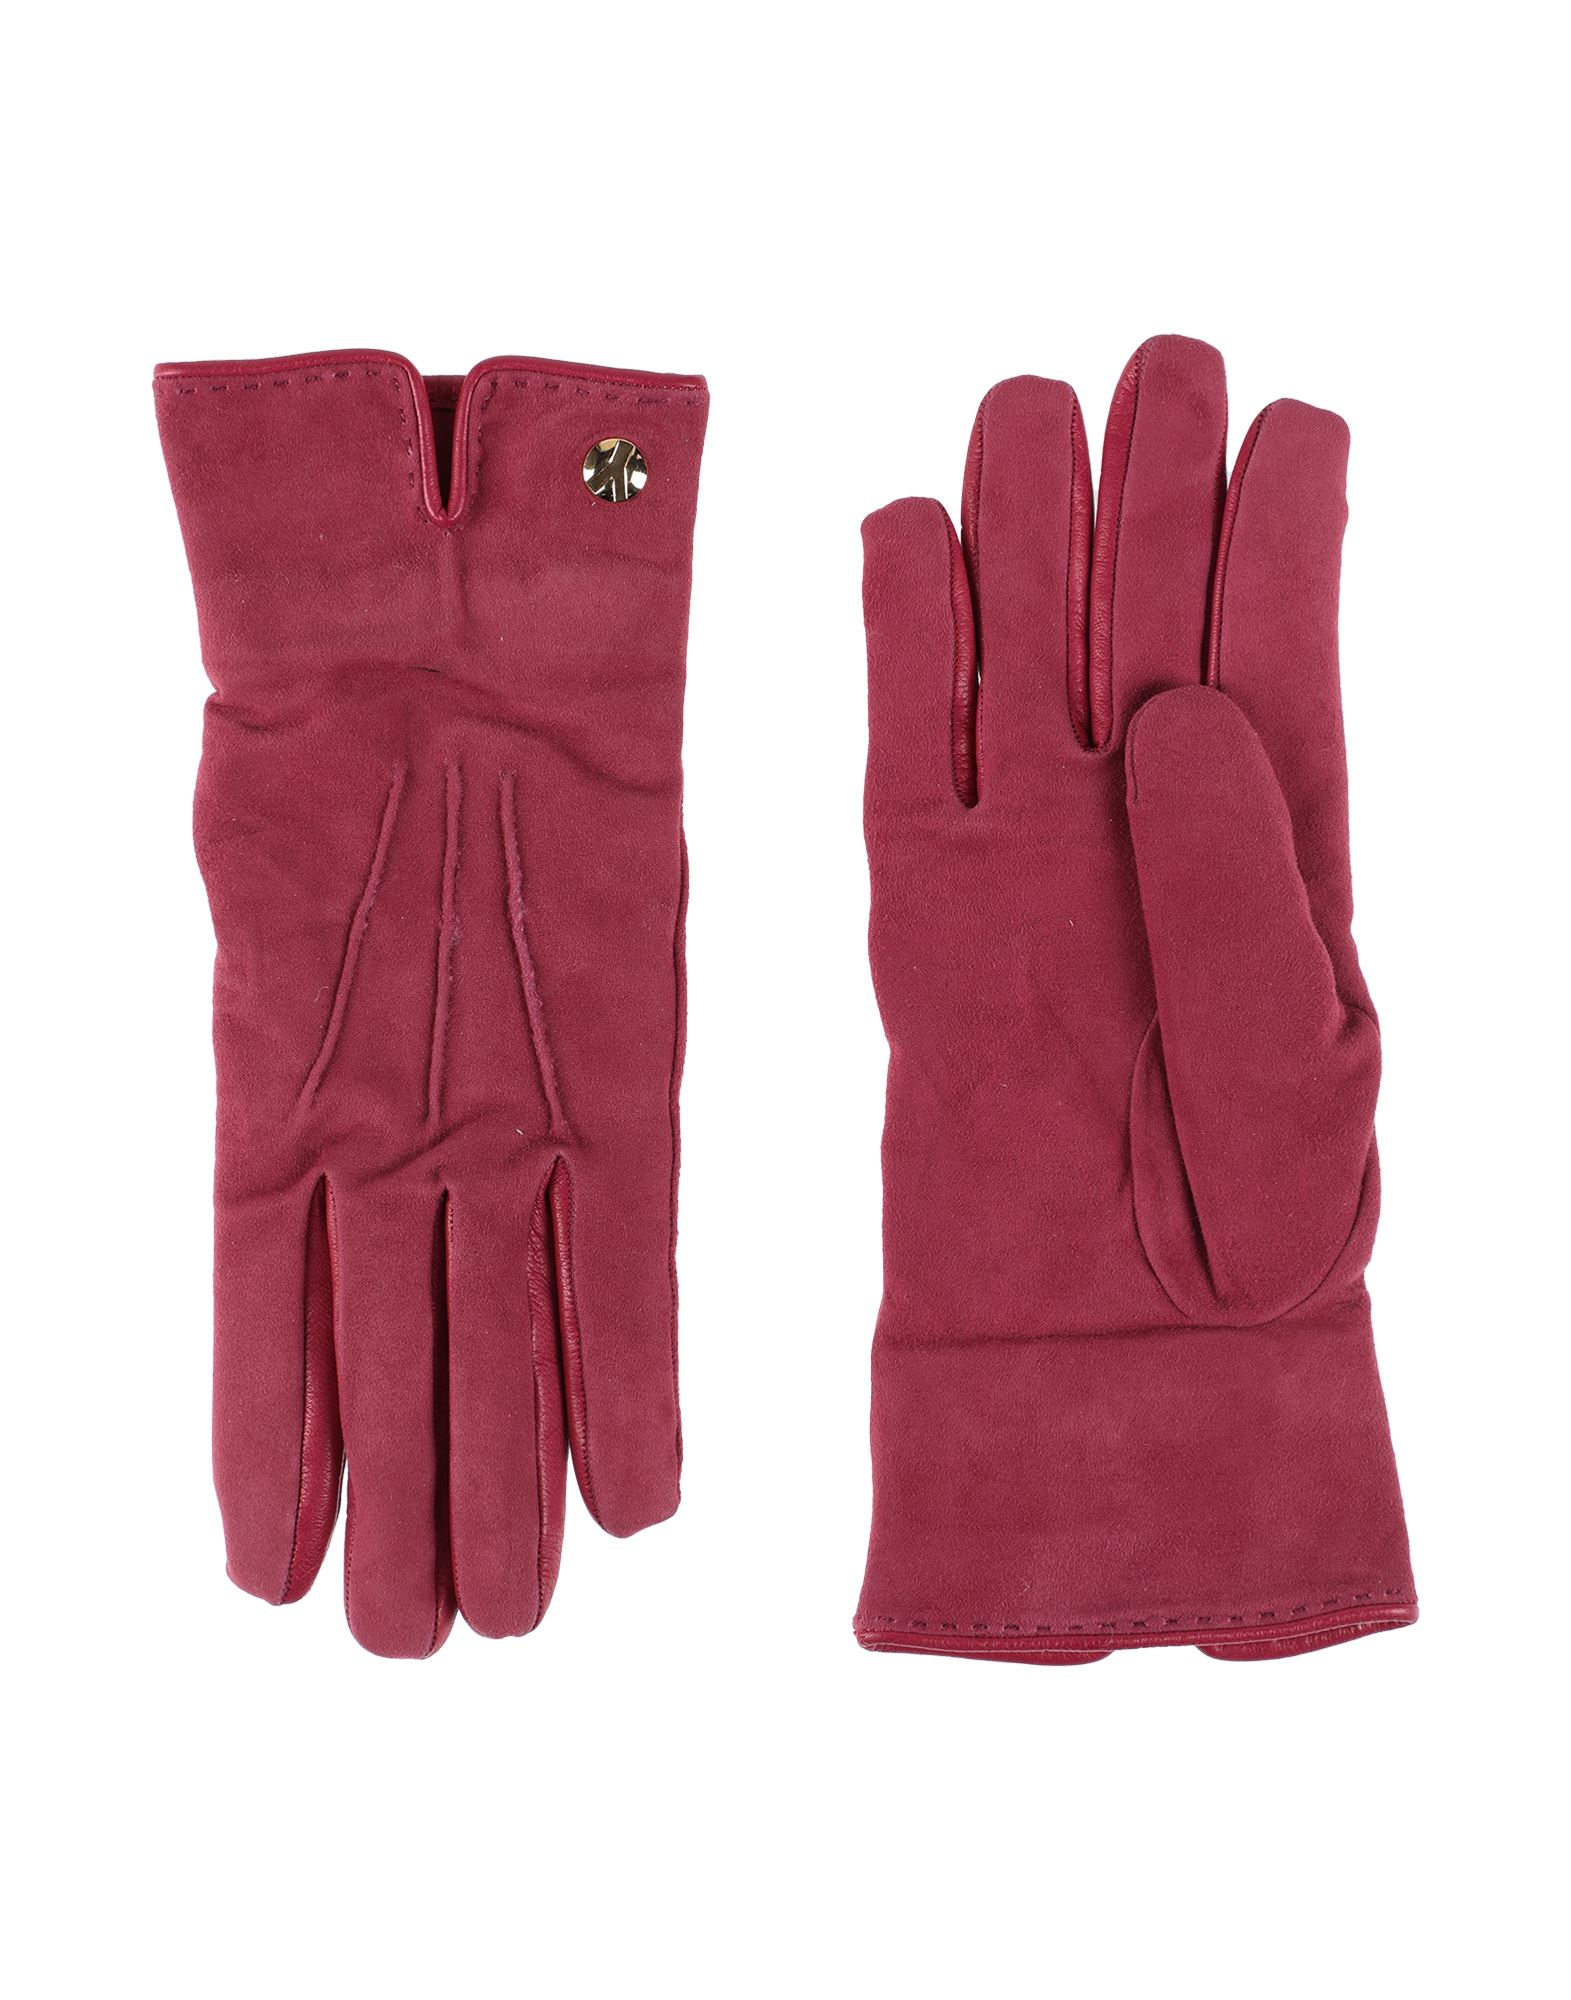 Saint Laurent Gloves In Garnet